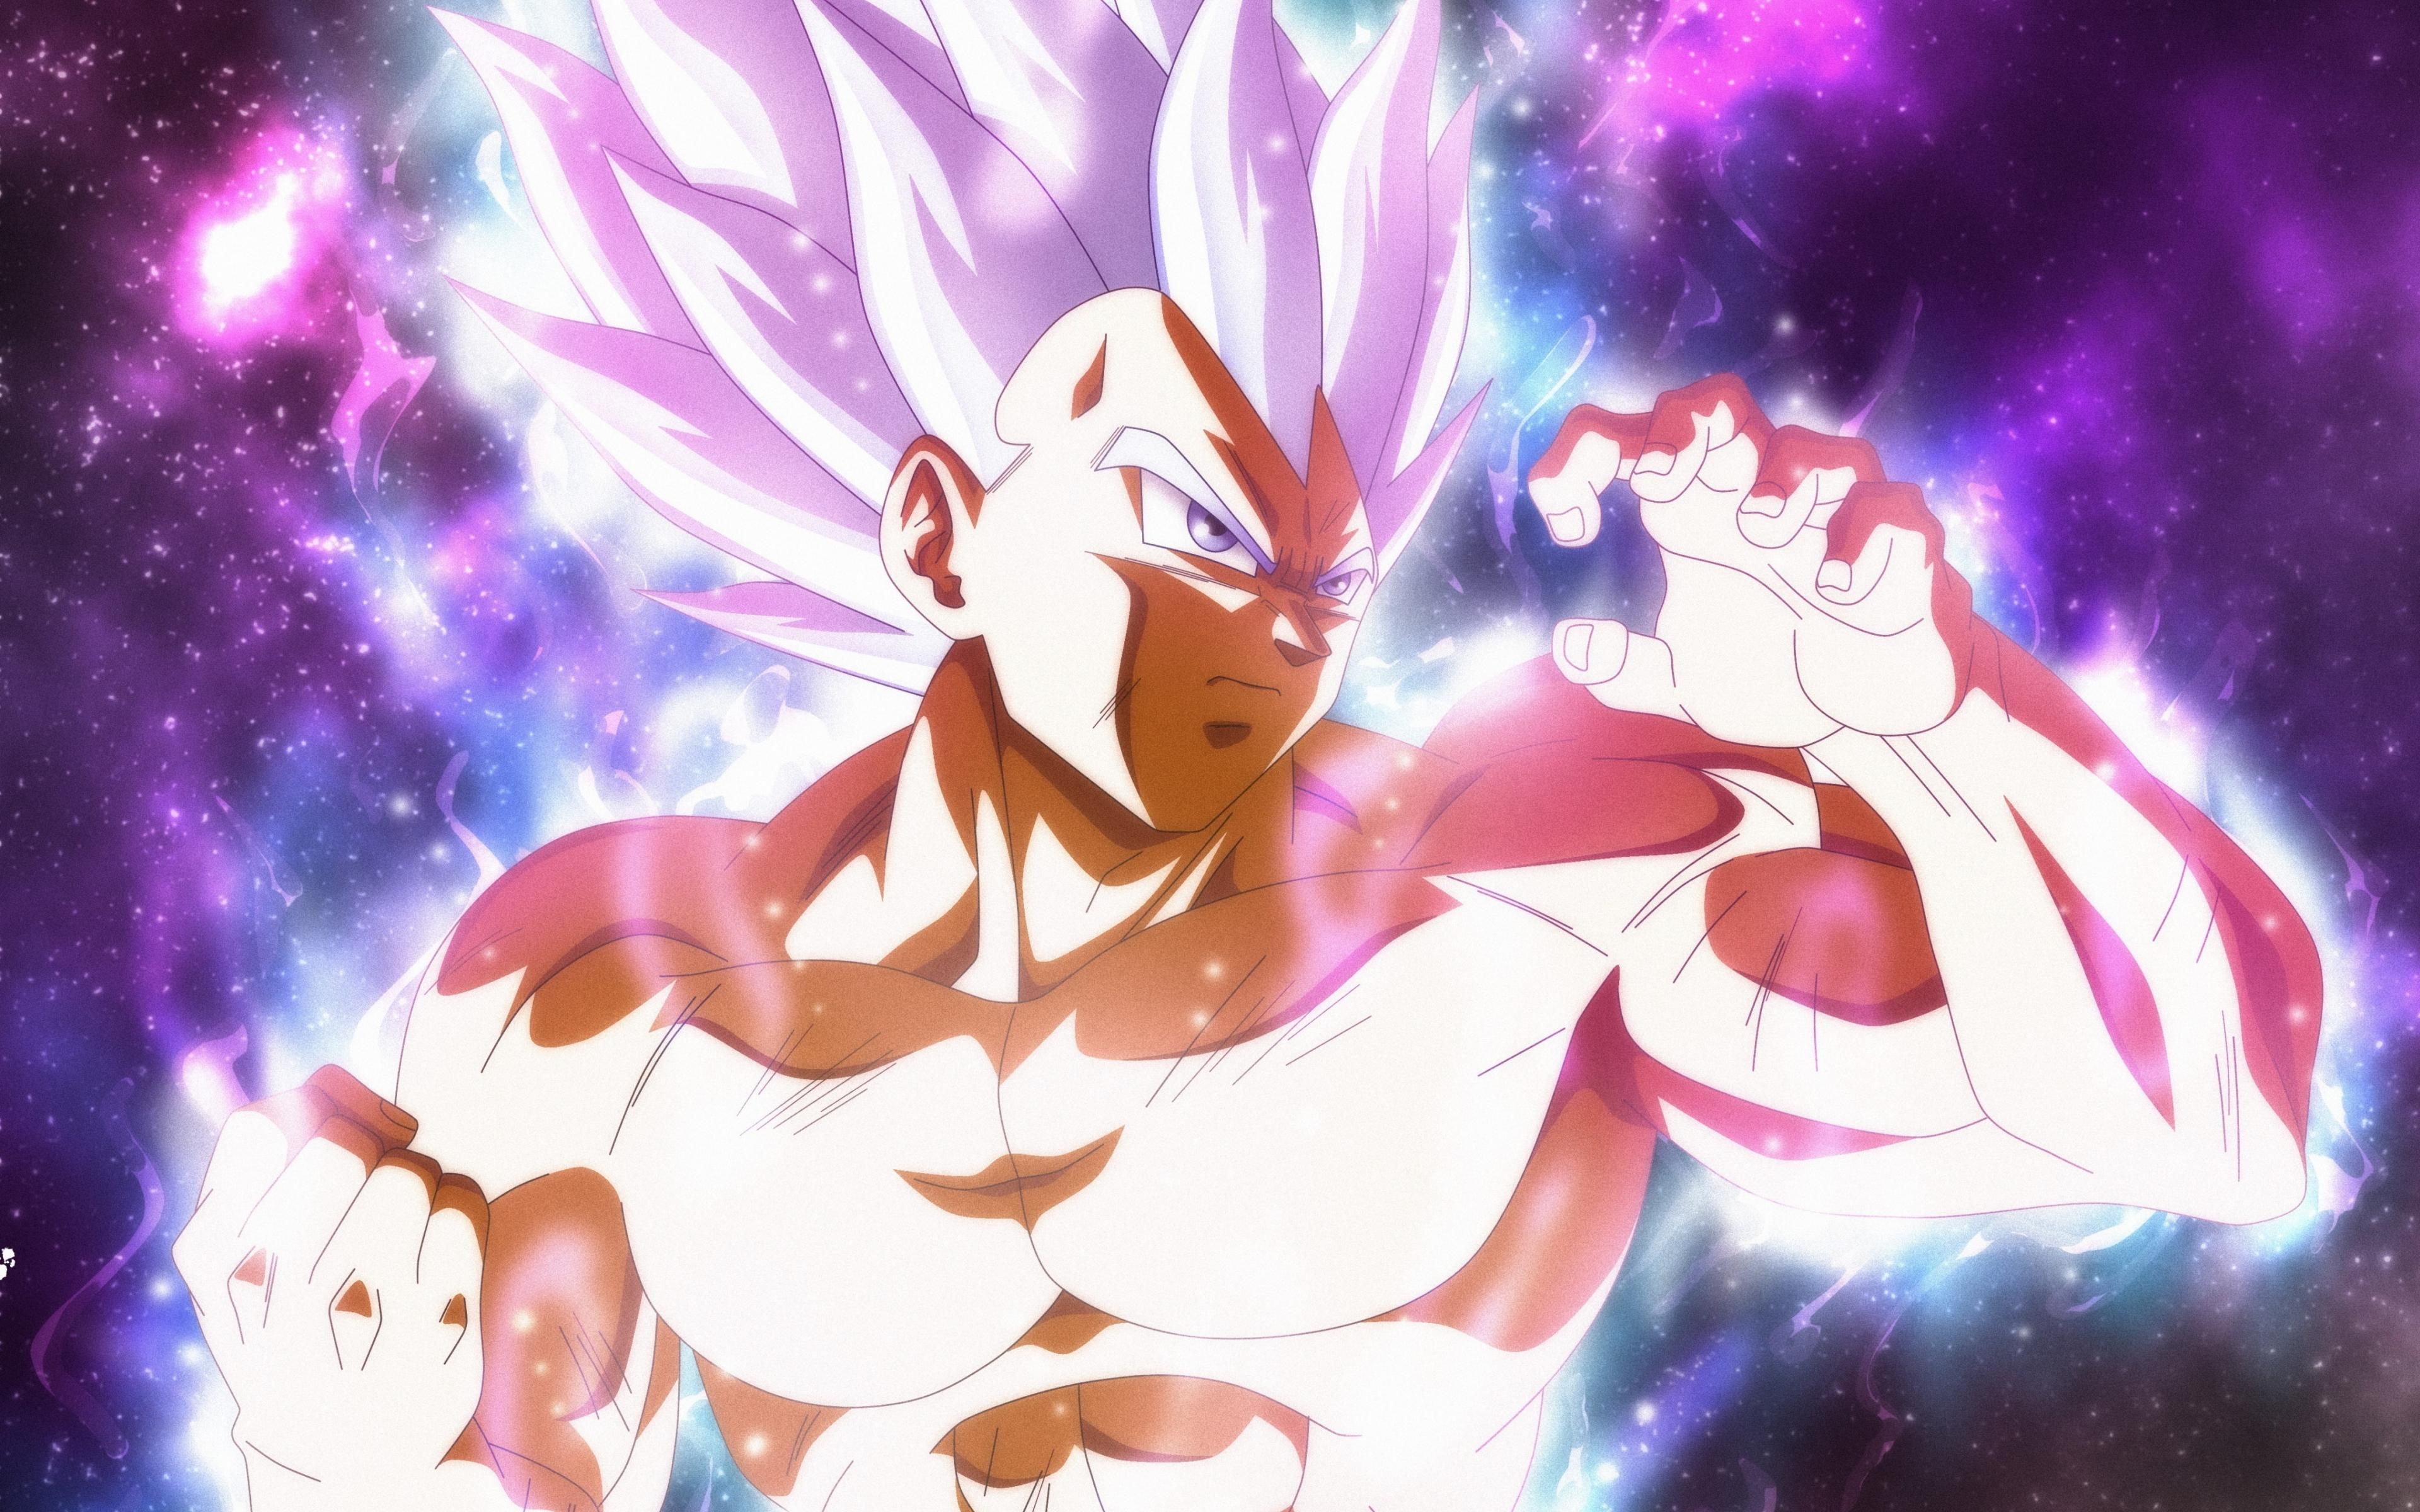 Ultra power vegeta anime boy dragon ball super 2018 3840x2400 wallpaper